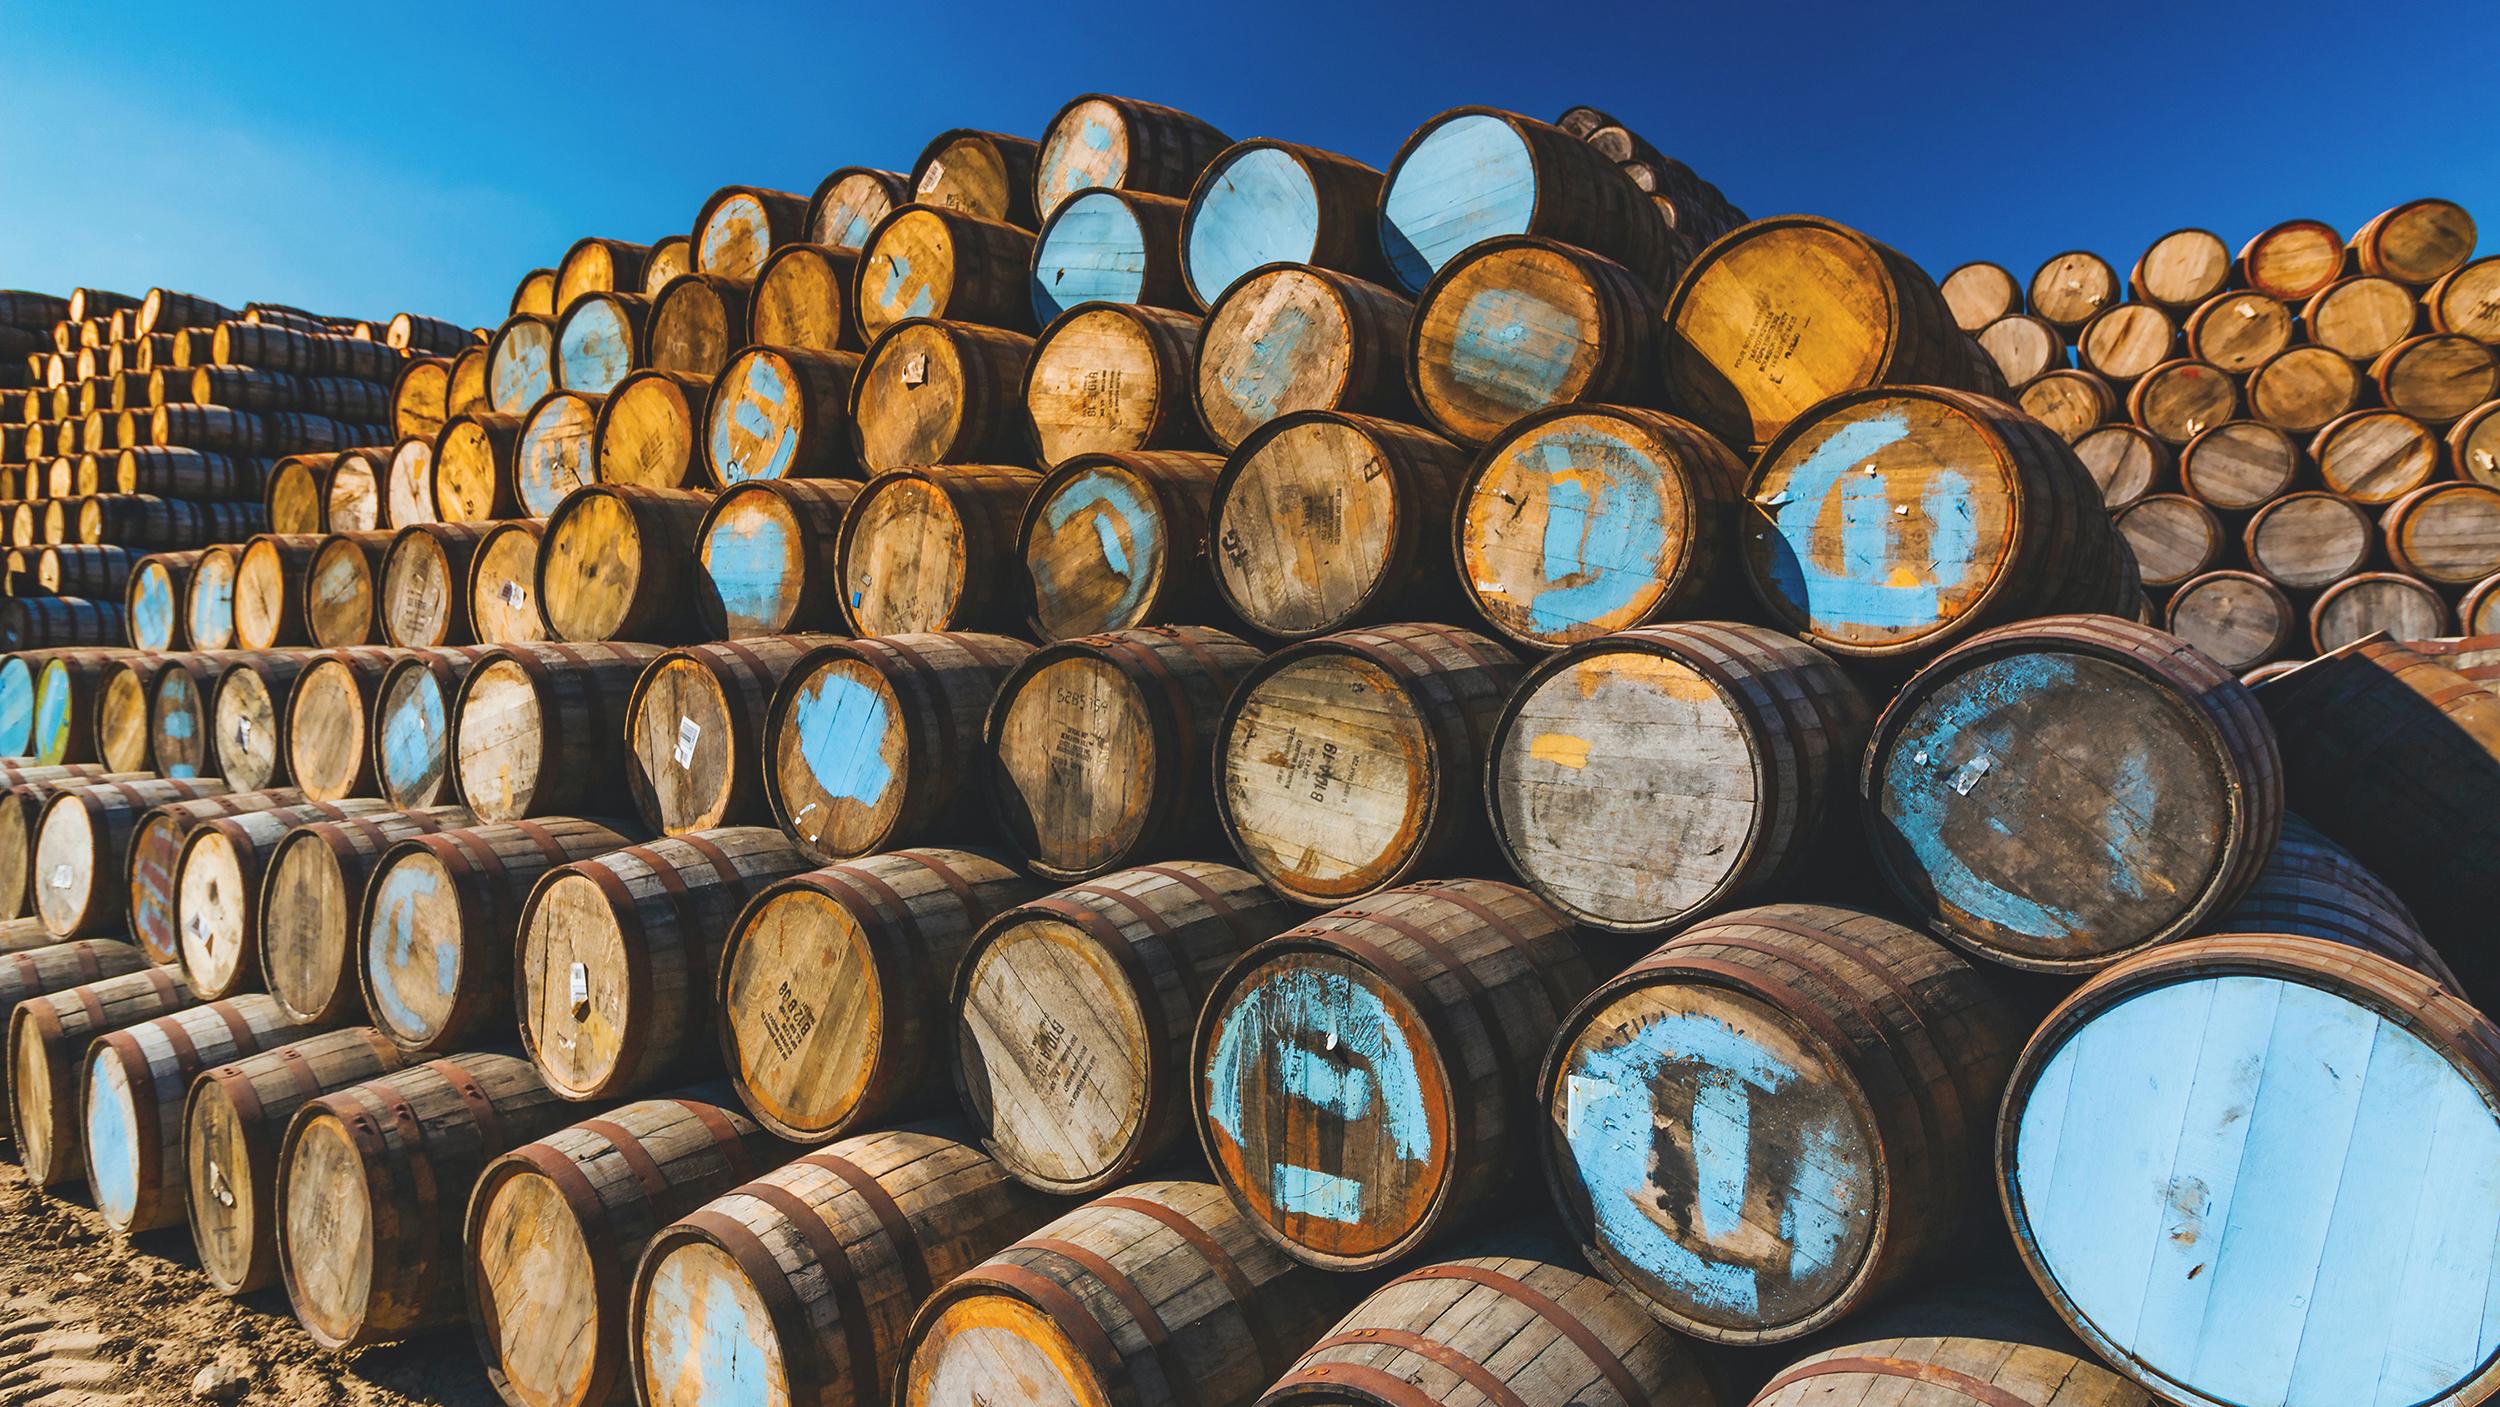 whisky casks brian-taylor-27hPQyRyhrk-unsplash(1)